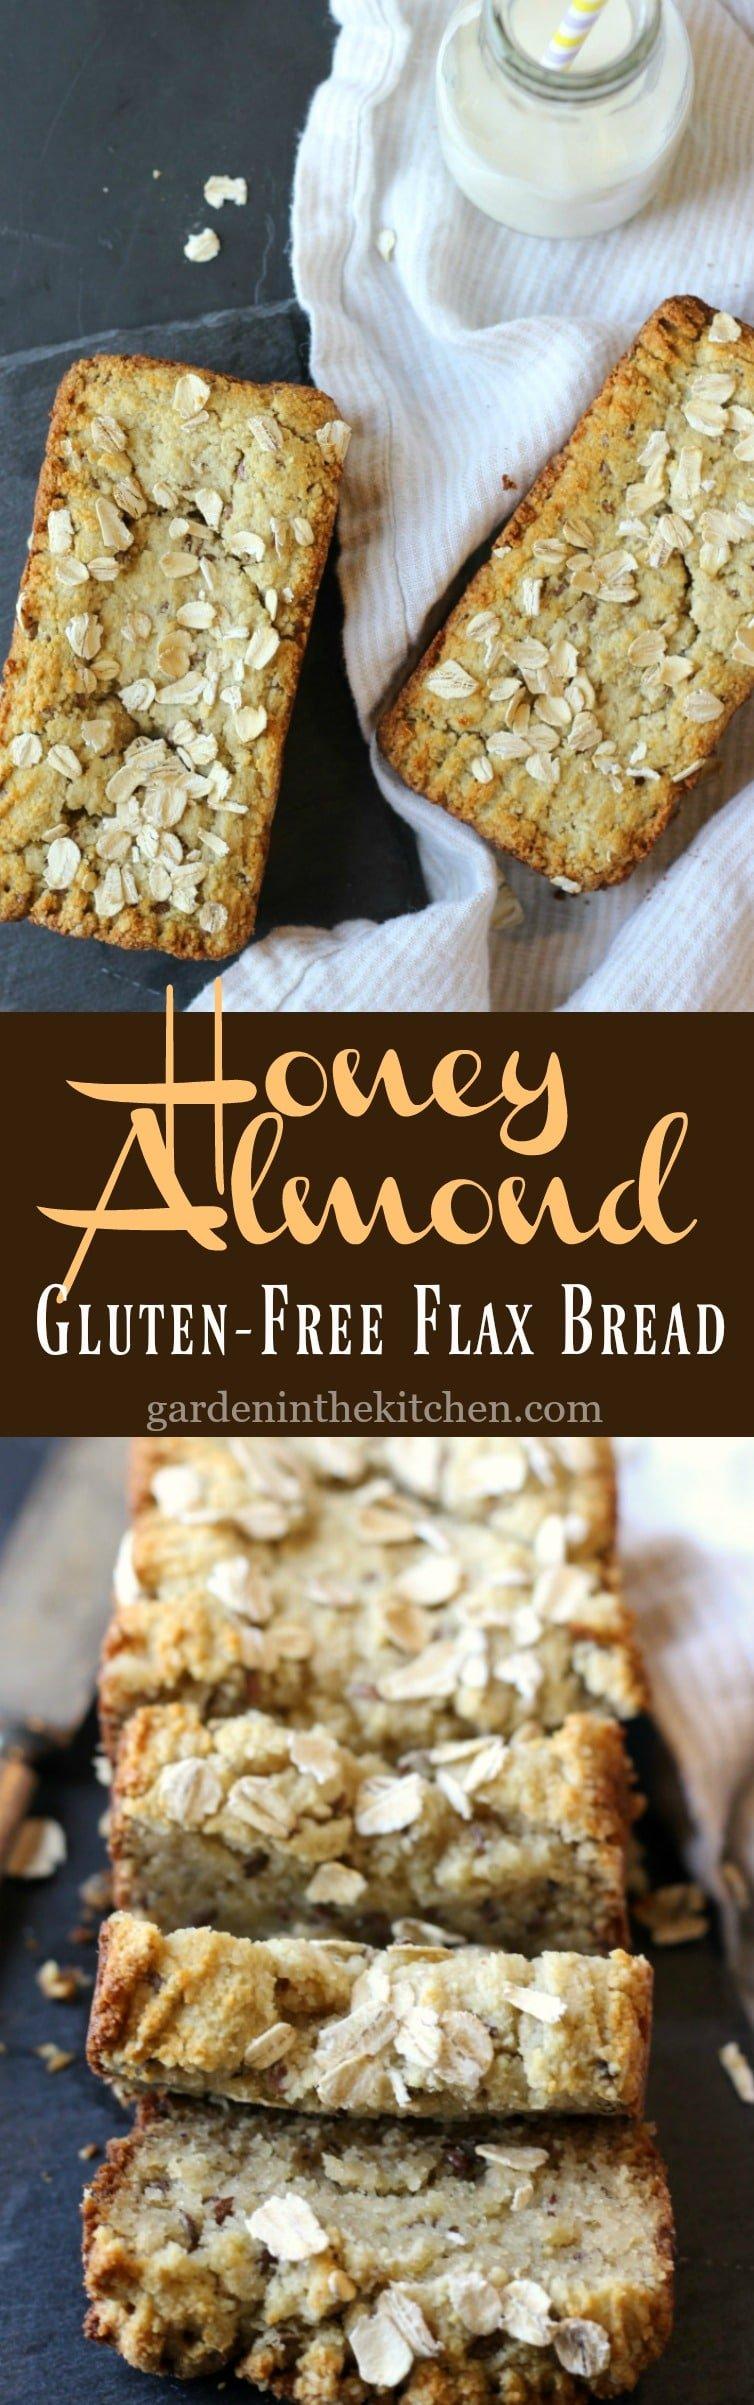 Honey Almond Flax Bread